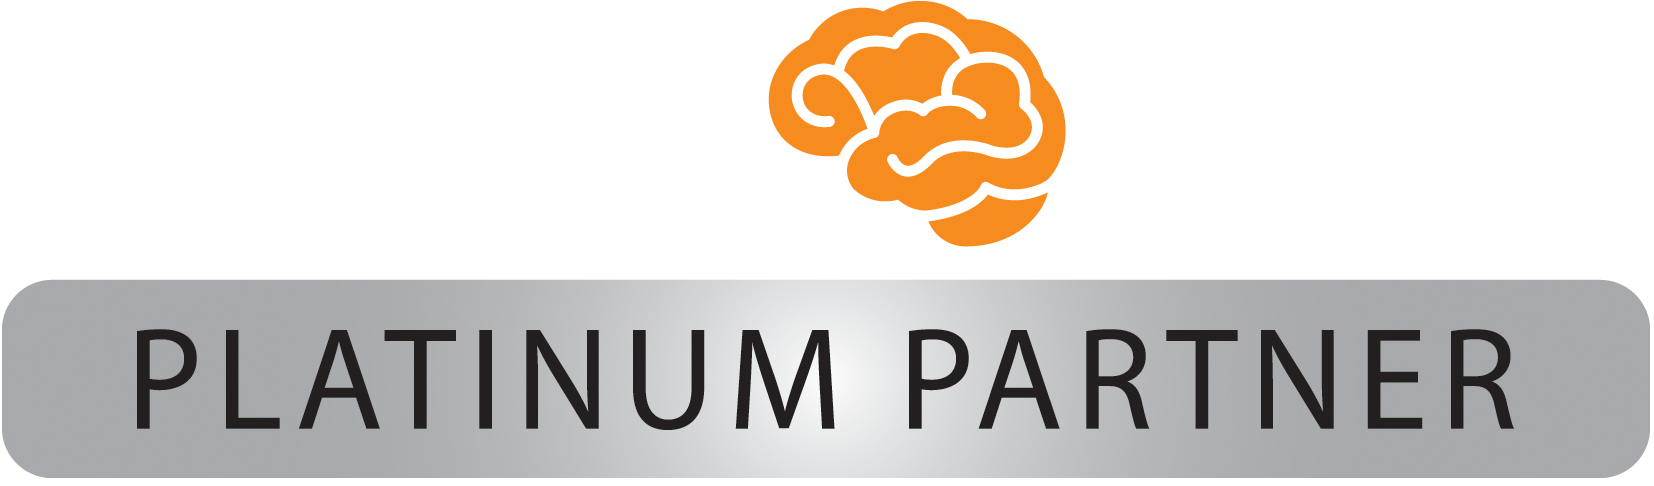 SeventhSensePlatinumPartner